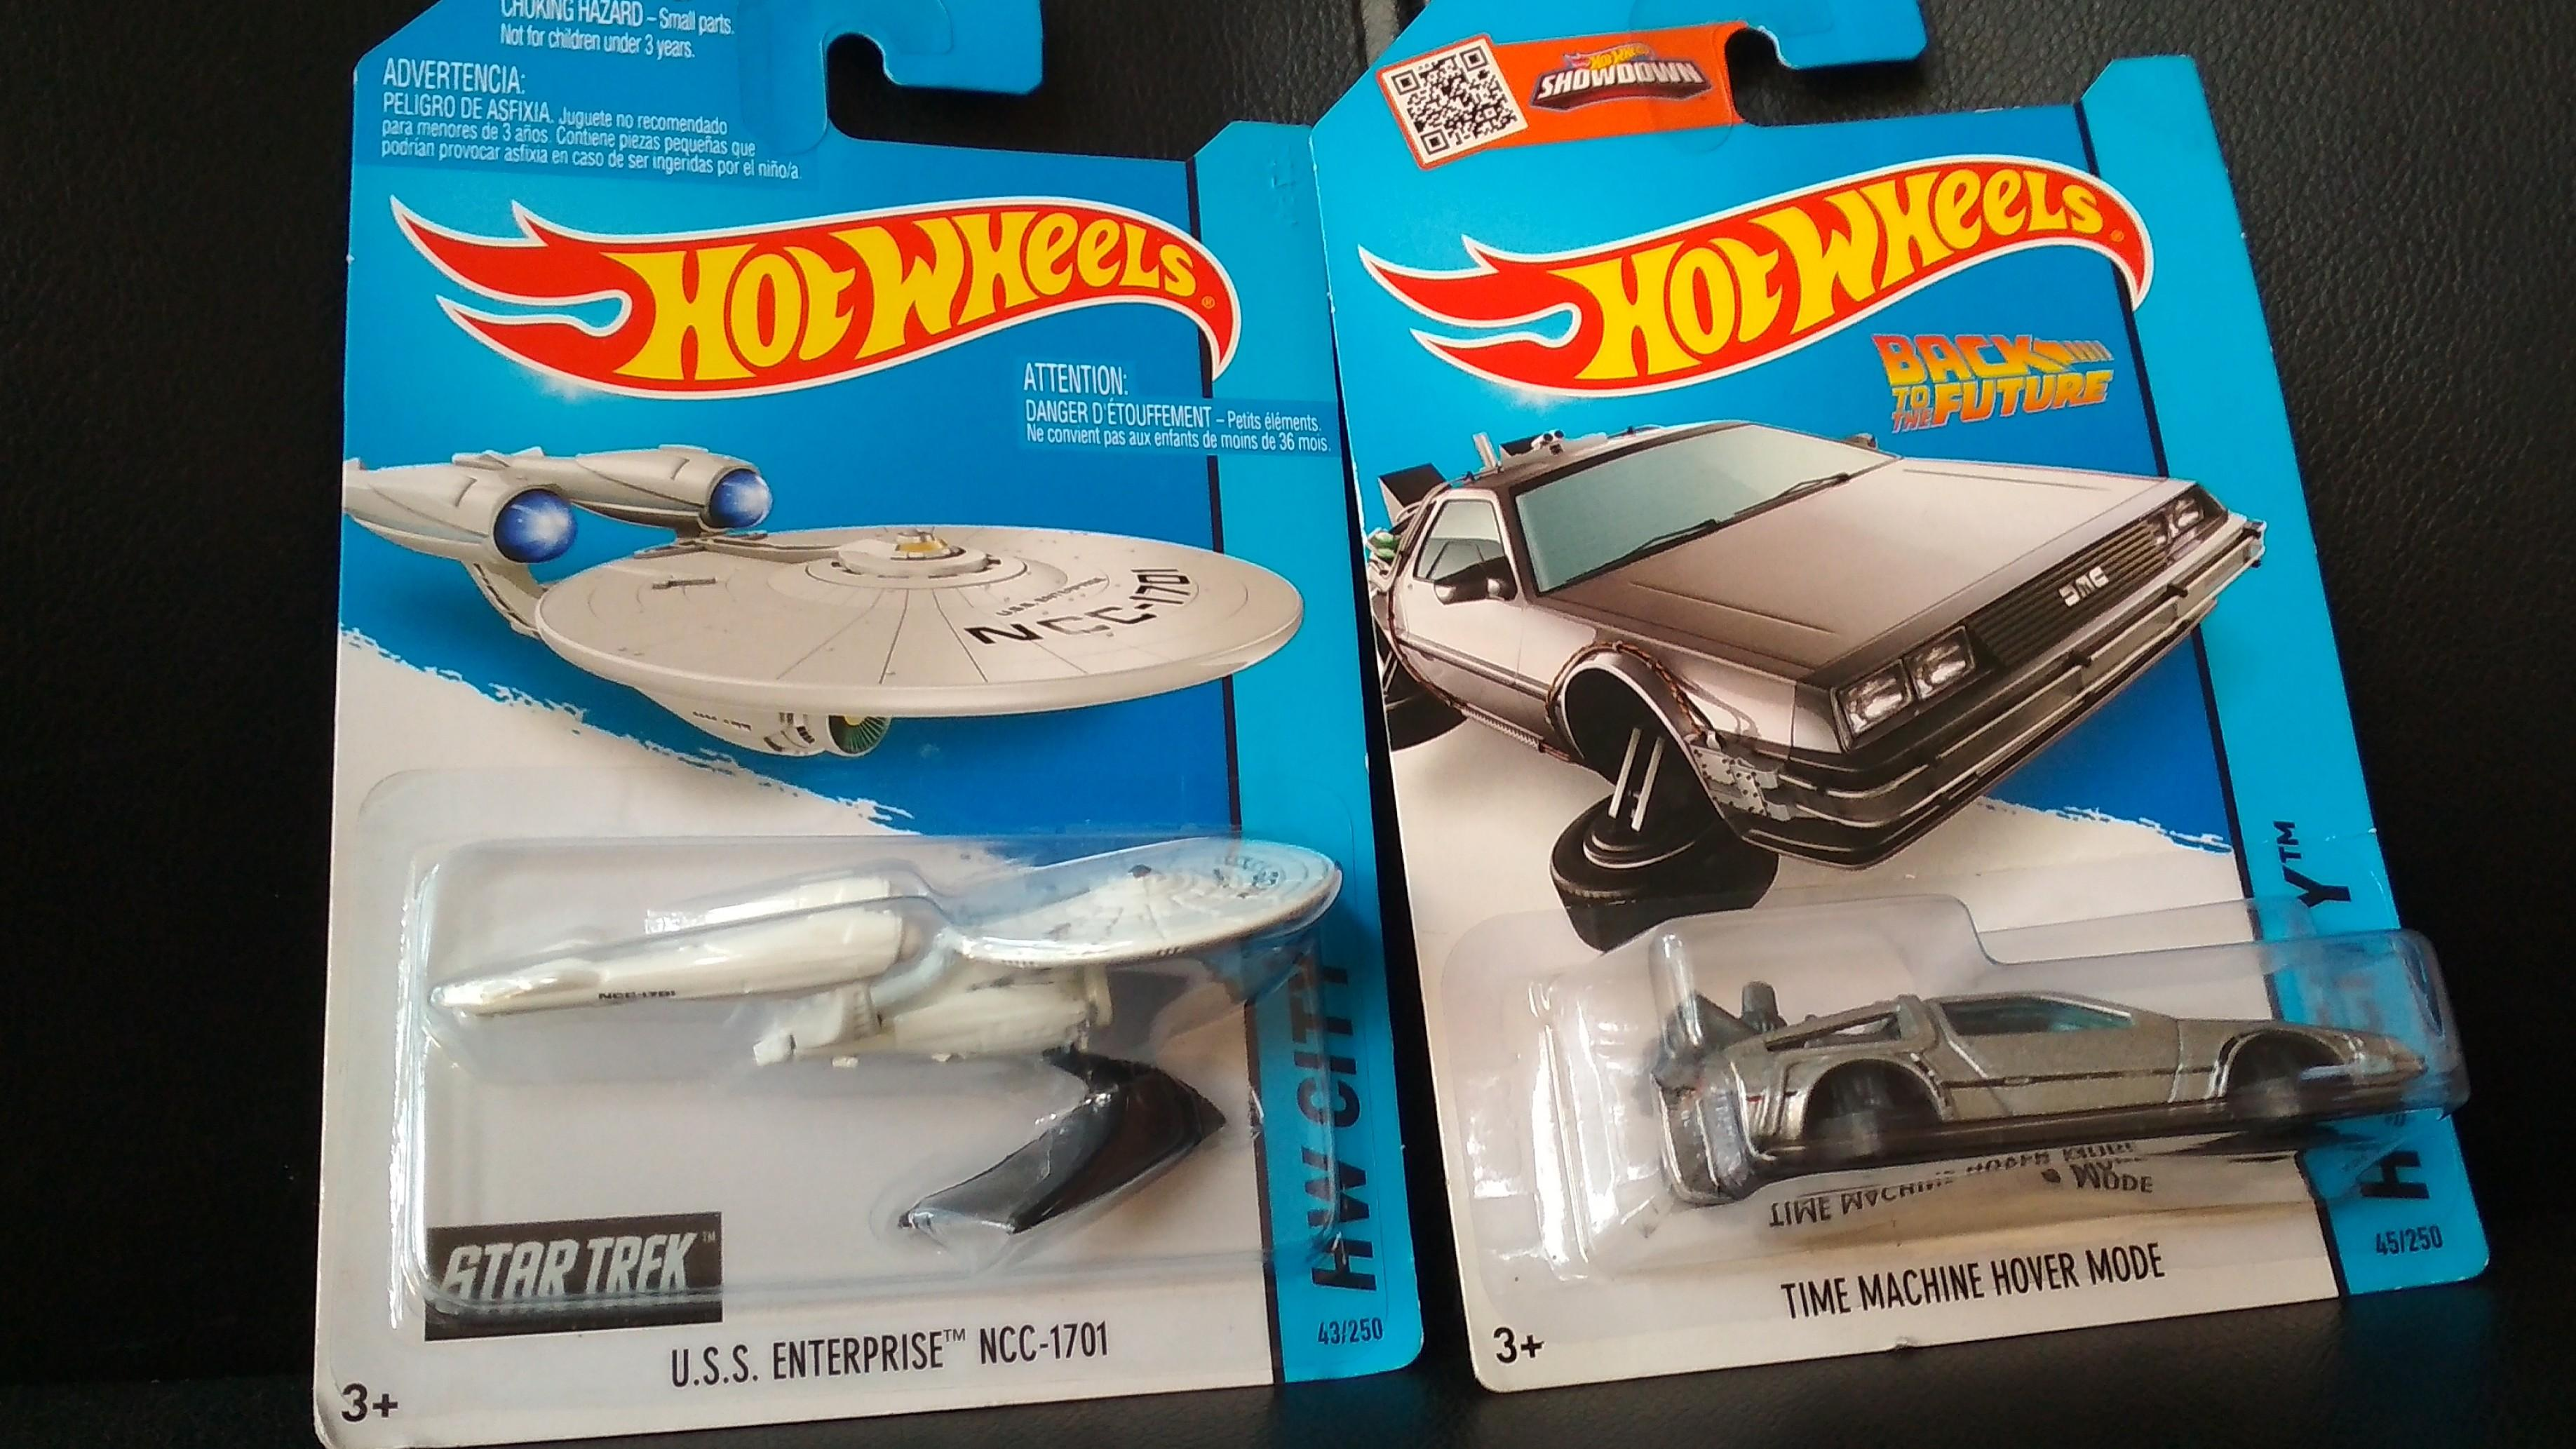 Hot Wheels startrek🖖 back to the future